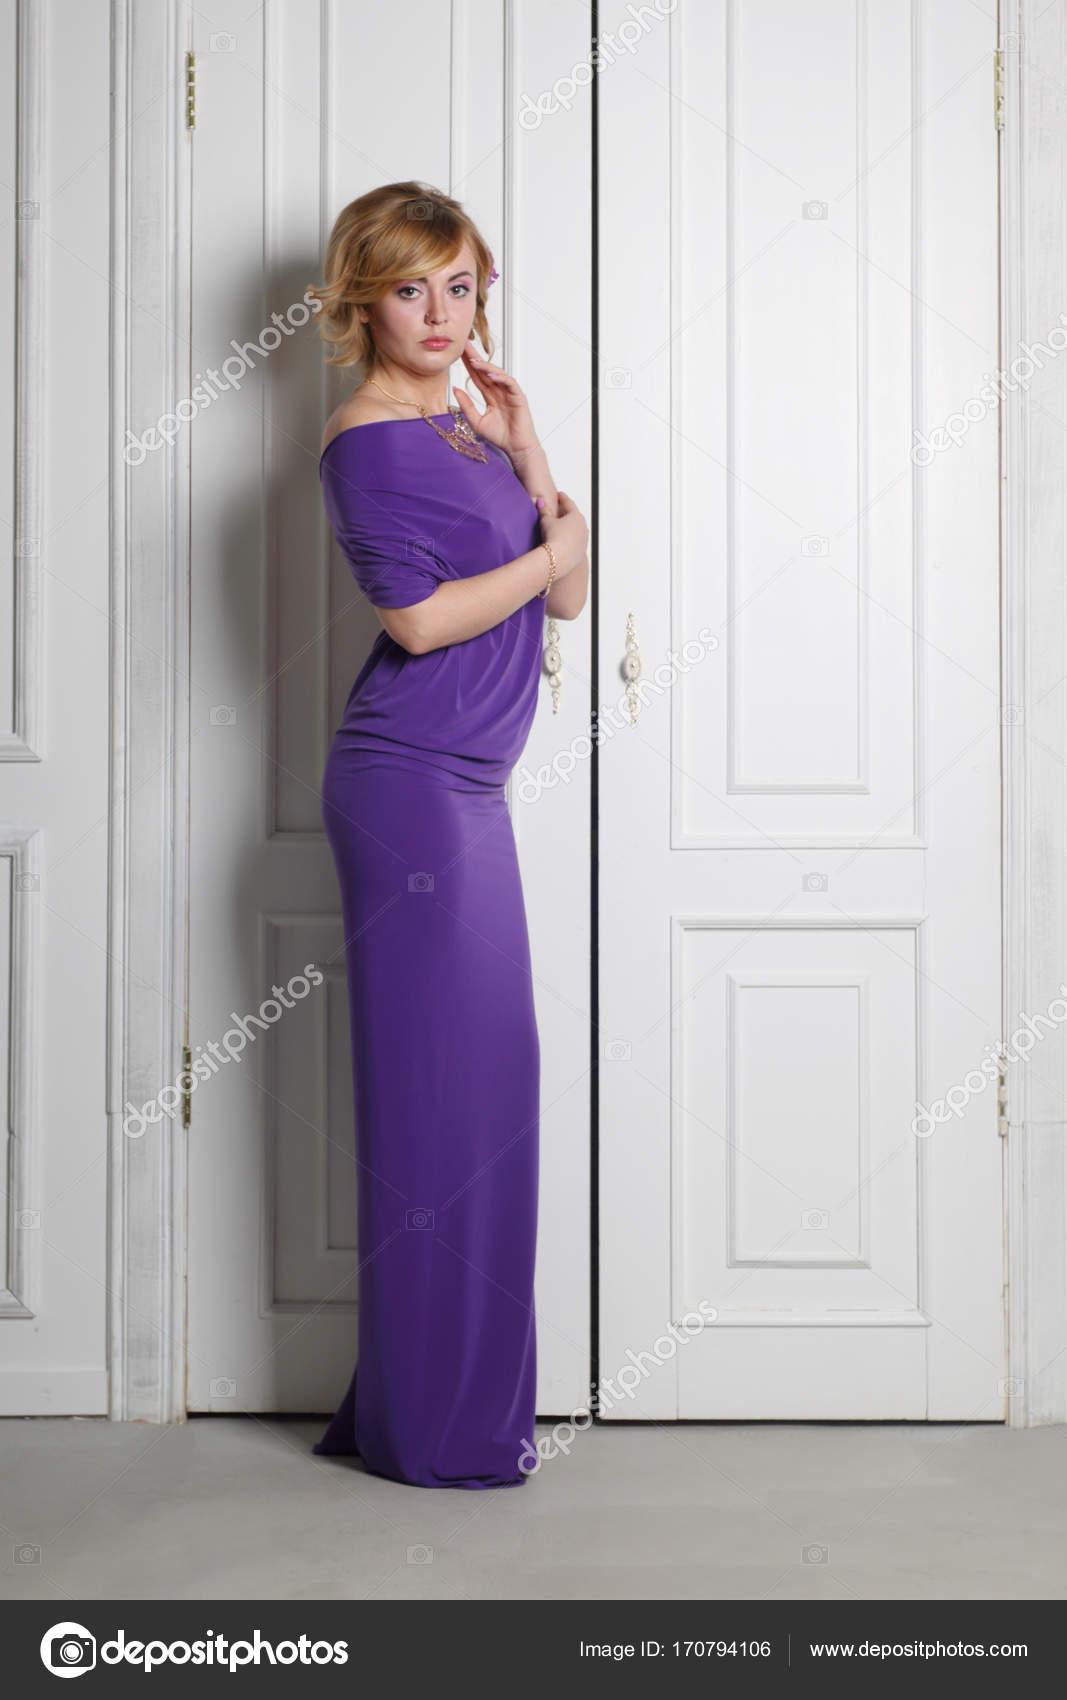 b7ddaf97e9a6 γυναίκα στο μακρύ μωβ φόρεμα με λουλούδι της τρίχας που παρουσιάζουν ...